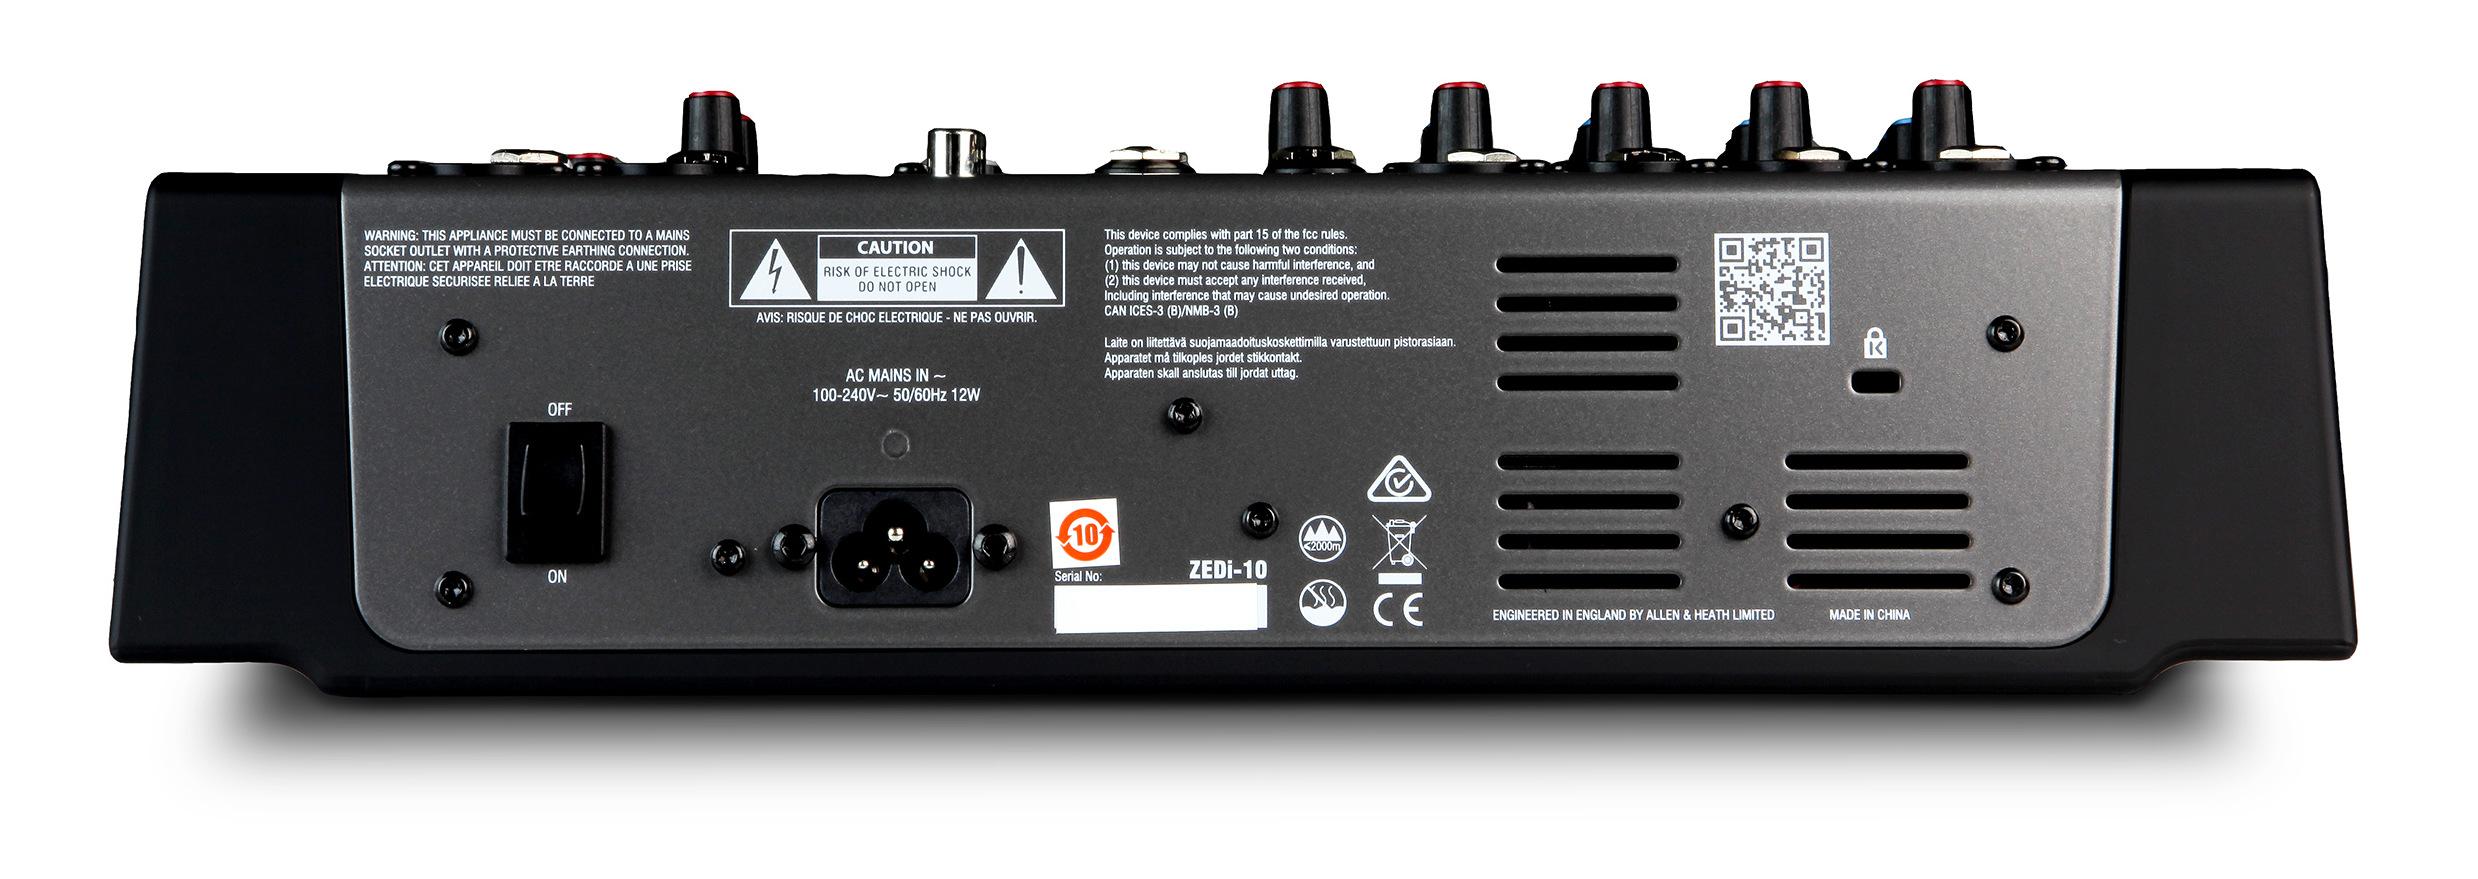 Hybrid Compact Mixer / 4×4 USB Interface